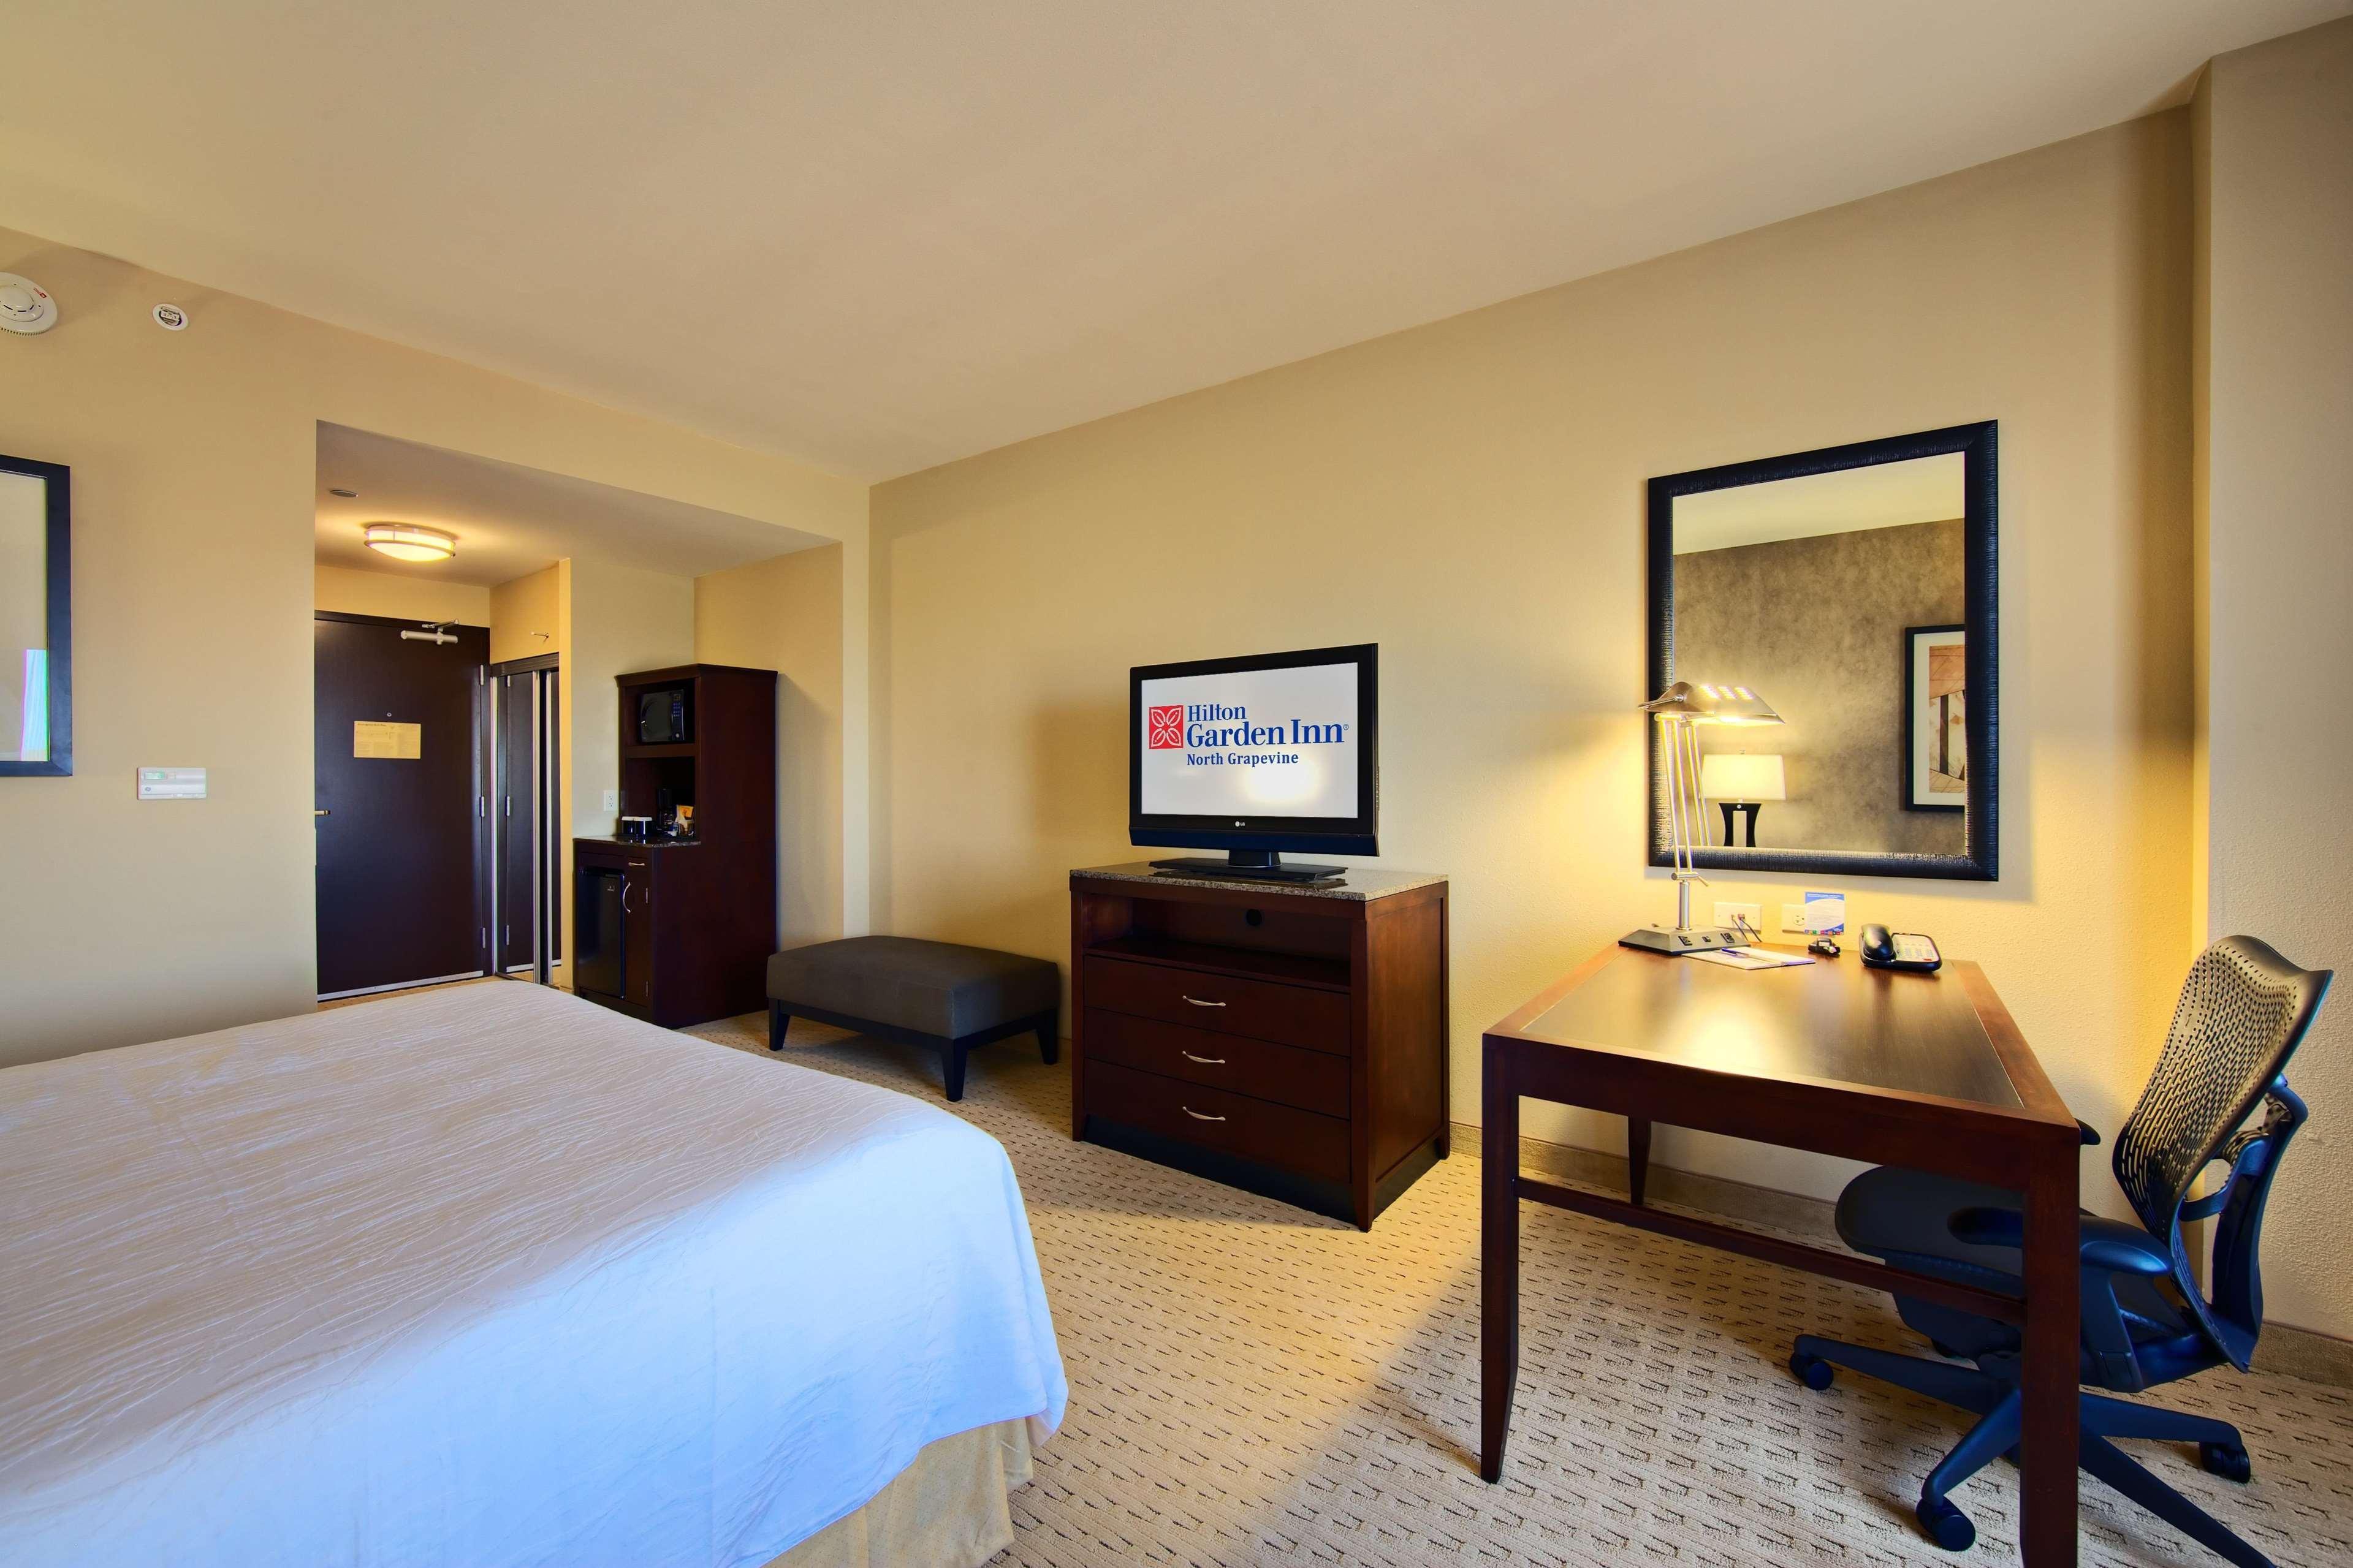 Hilton Garden Inn DFW North Grapevine image 28